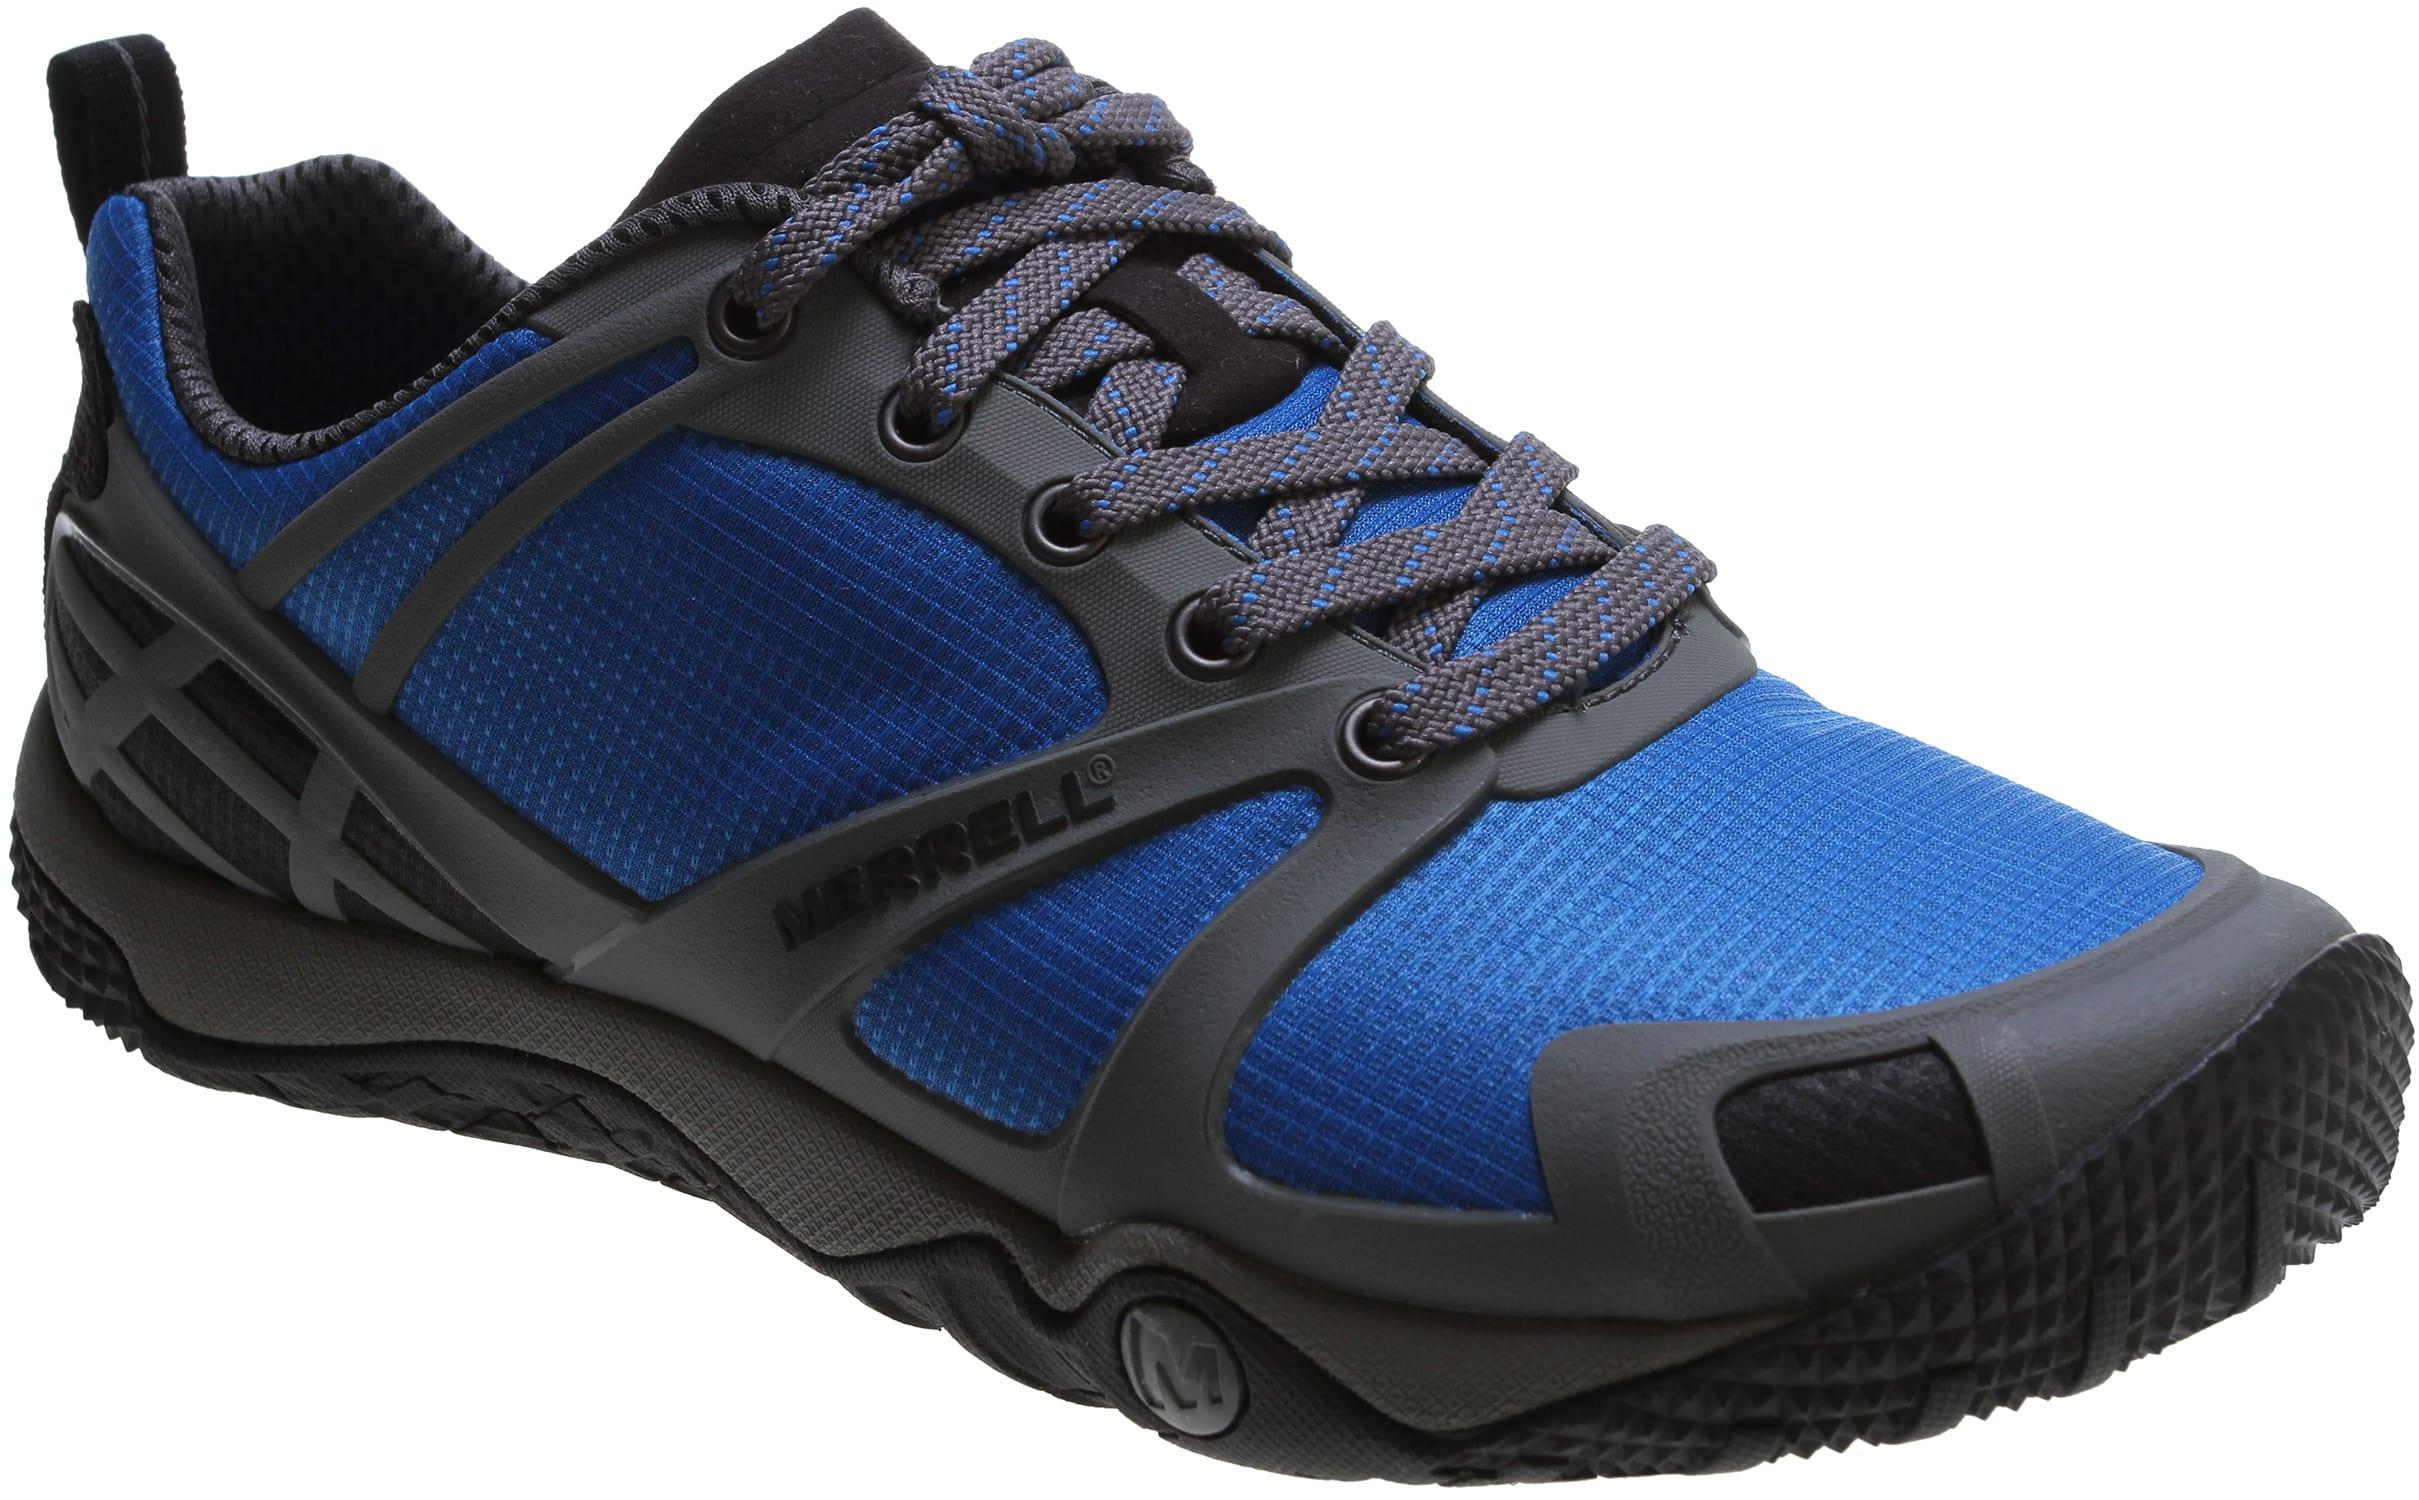 55b5994b97fd Merrell Proterra Sport Hiking Shoes - thumbnail 2